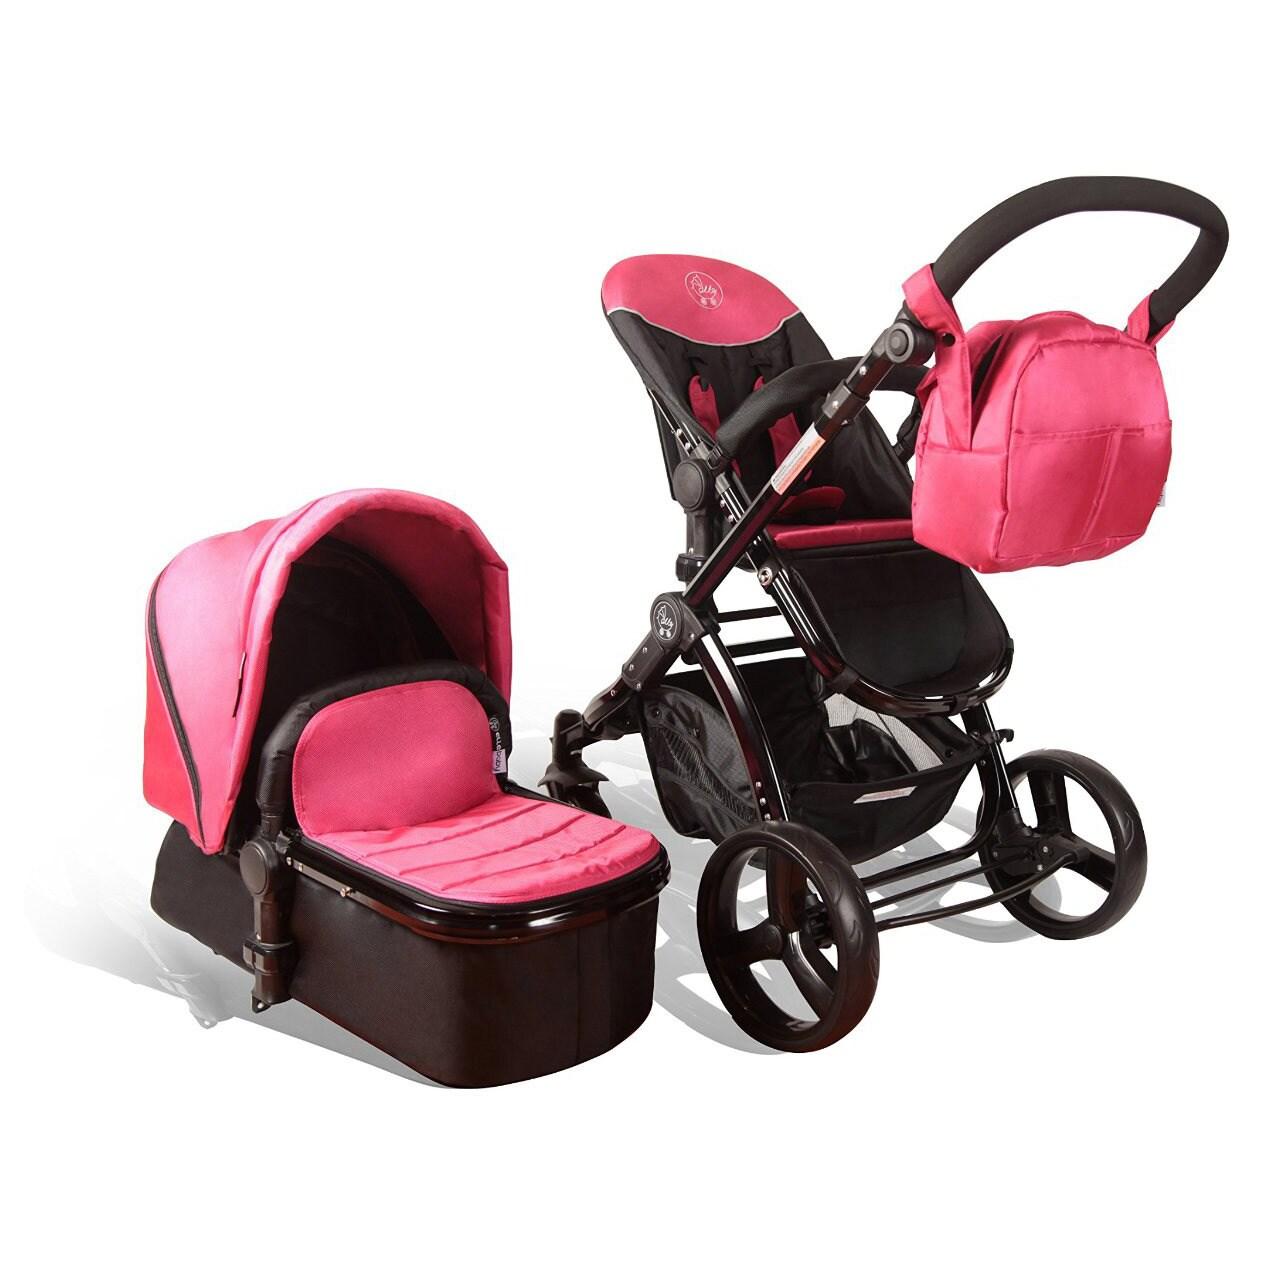 Babyelle Fold Up Infant Seat With Melodies And Soothing Vibrations - Baby Elle Kursi Lipat Bayi